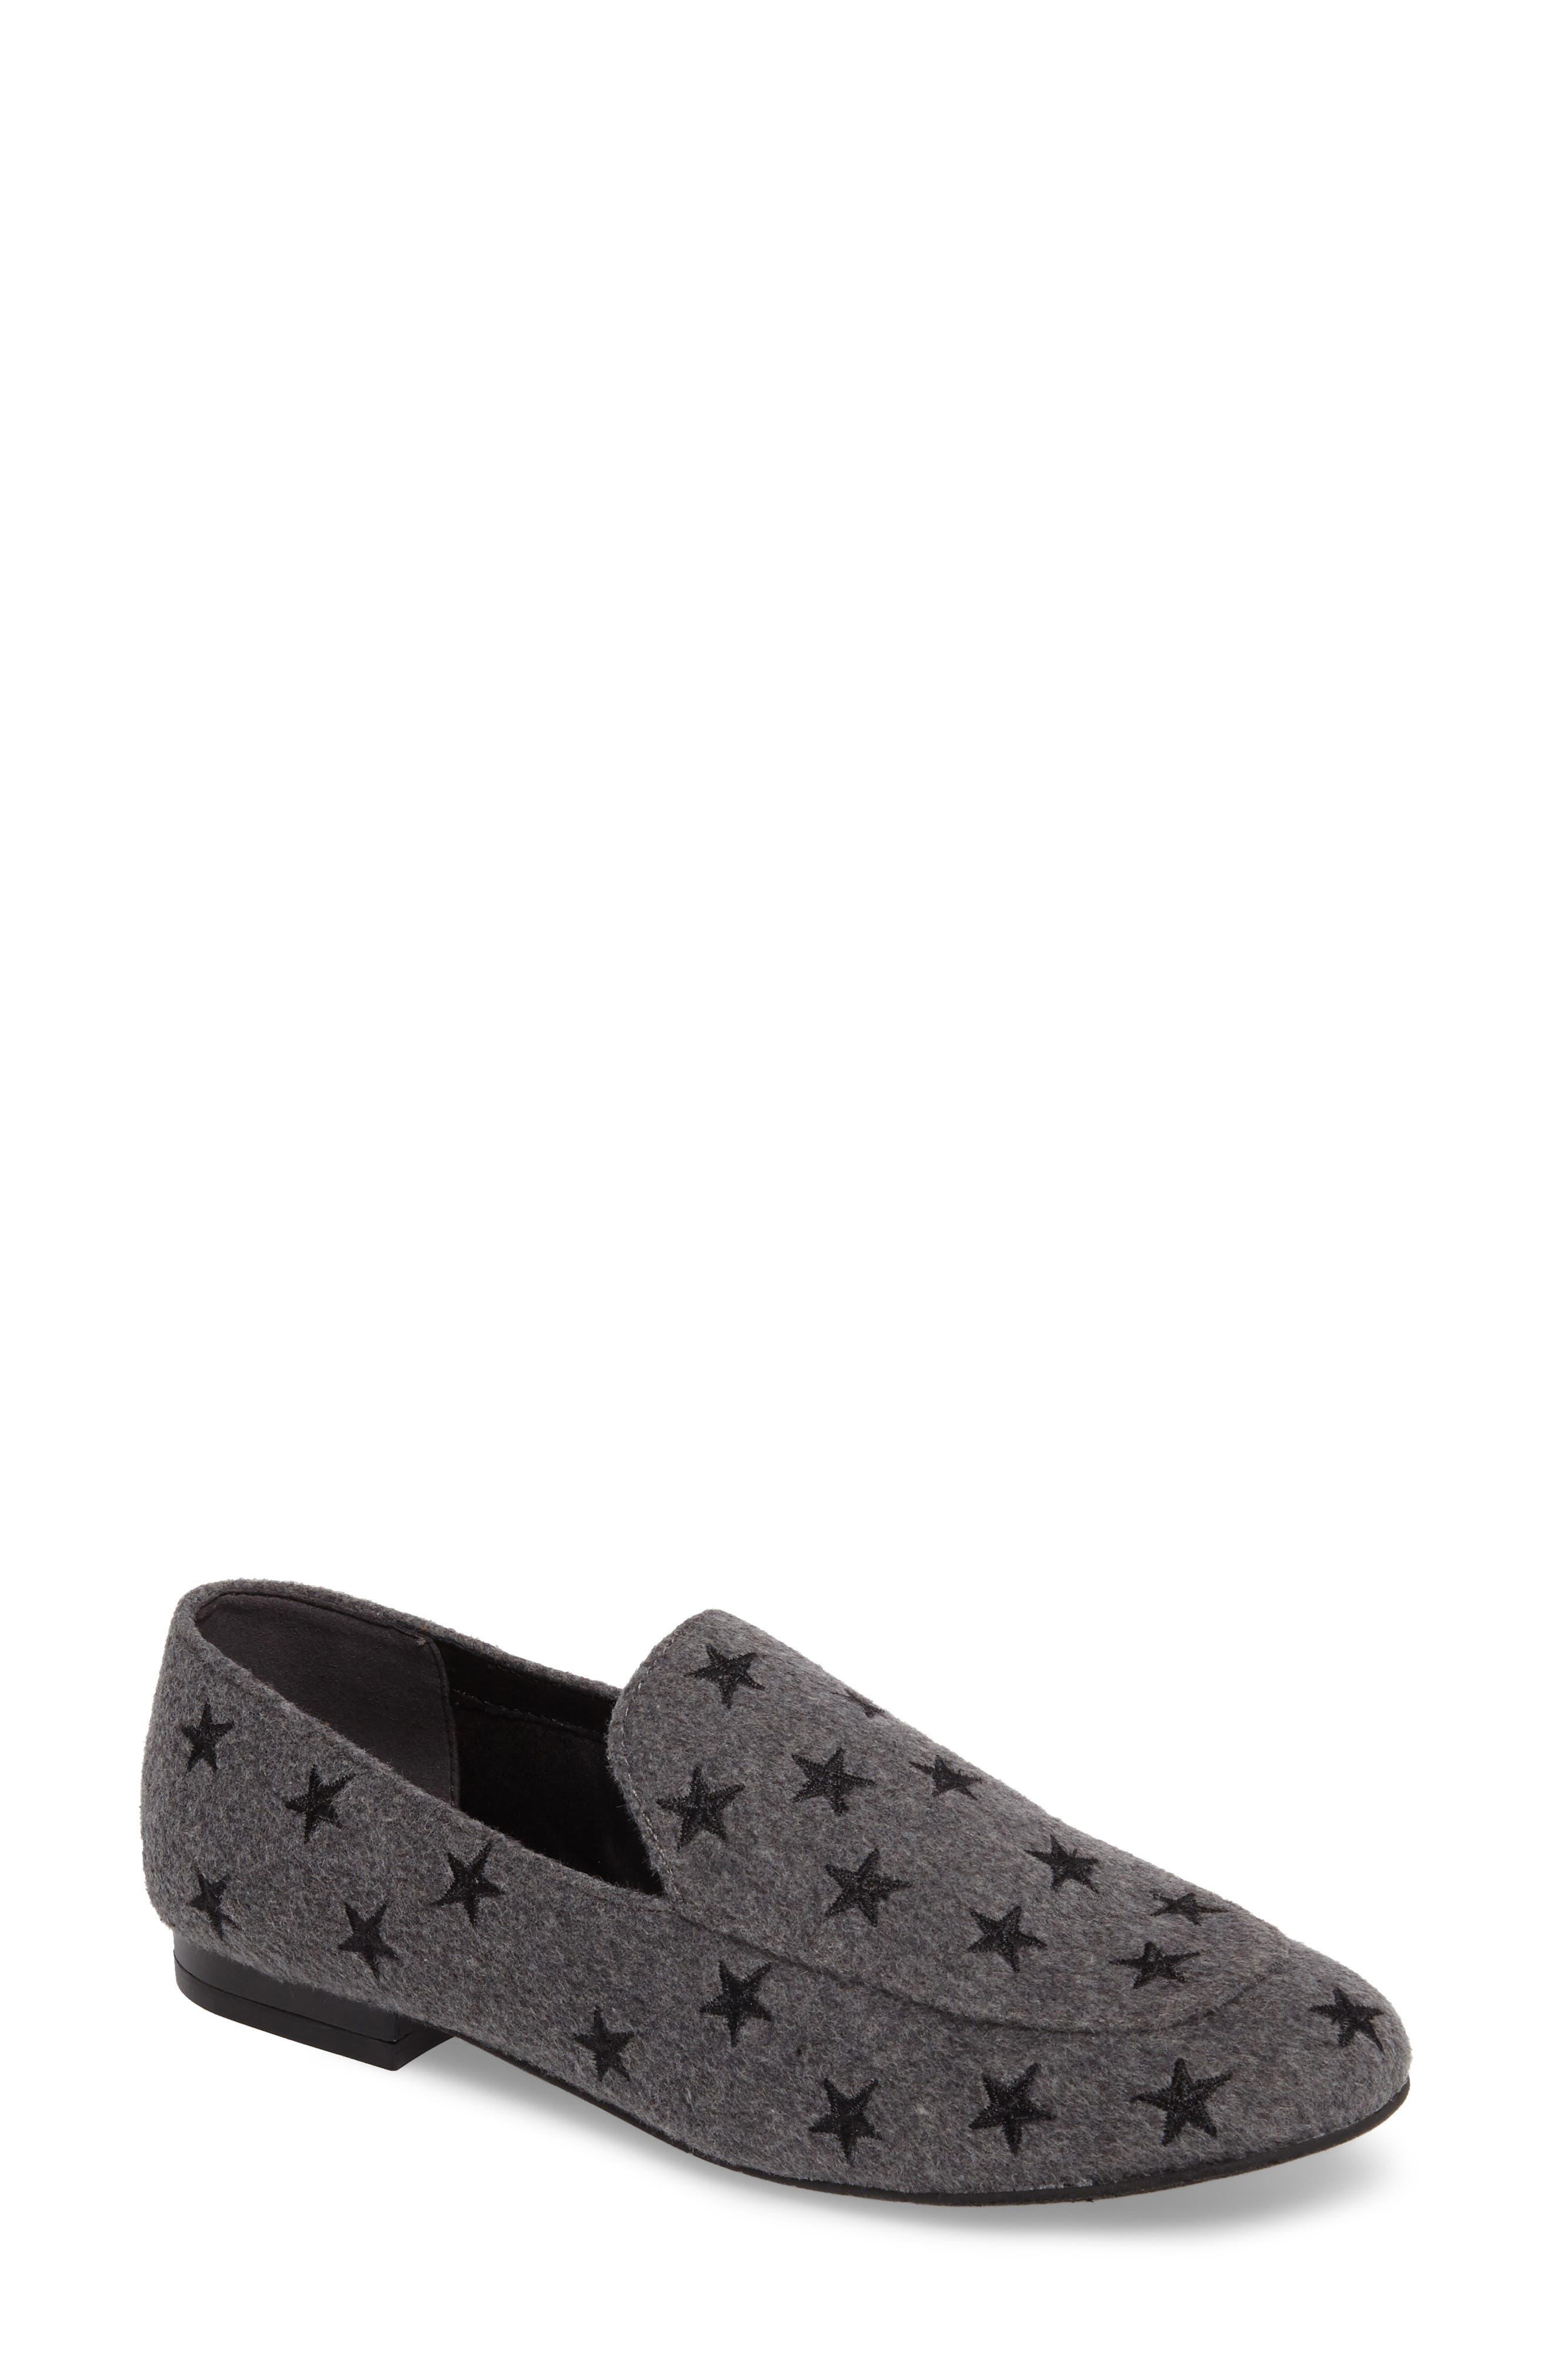 Westley 5 Loafer,                             Main thumbnail 1, color,                             Grey Felt Fabric